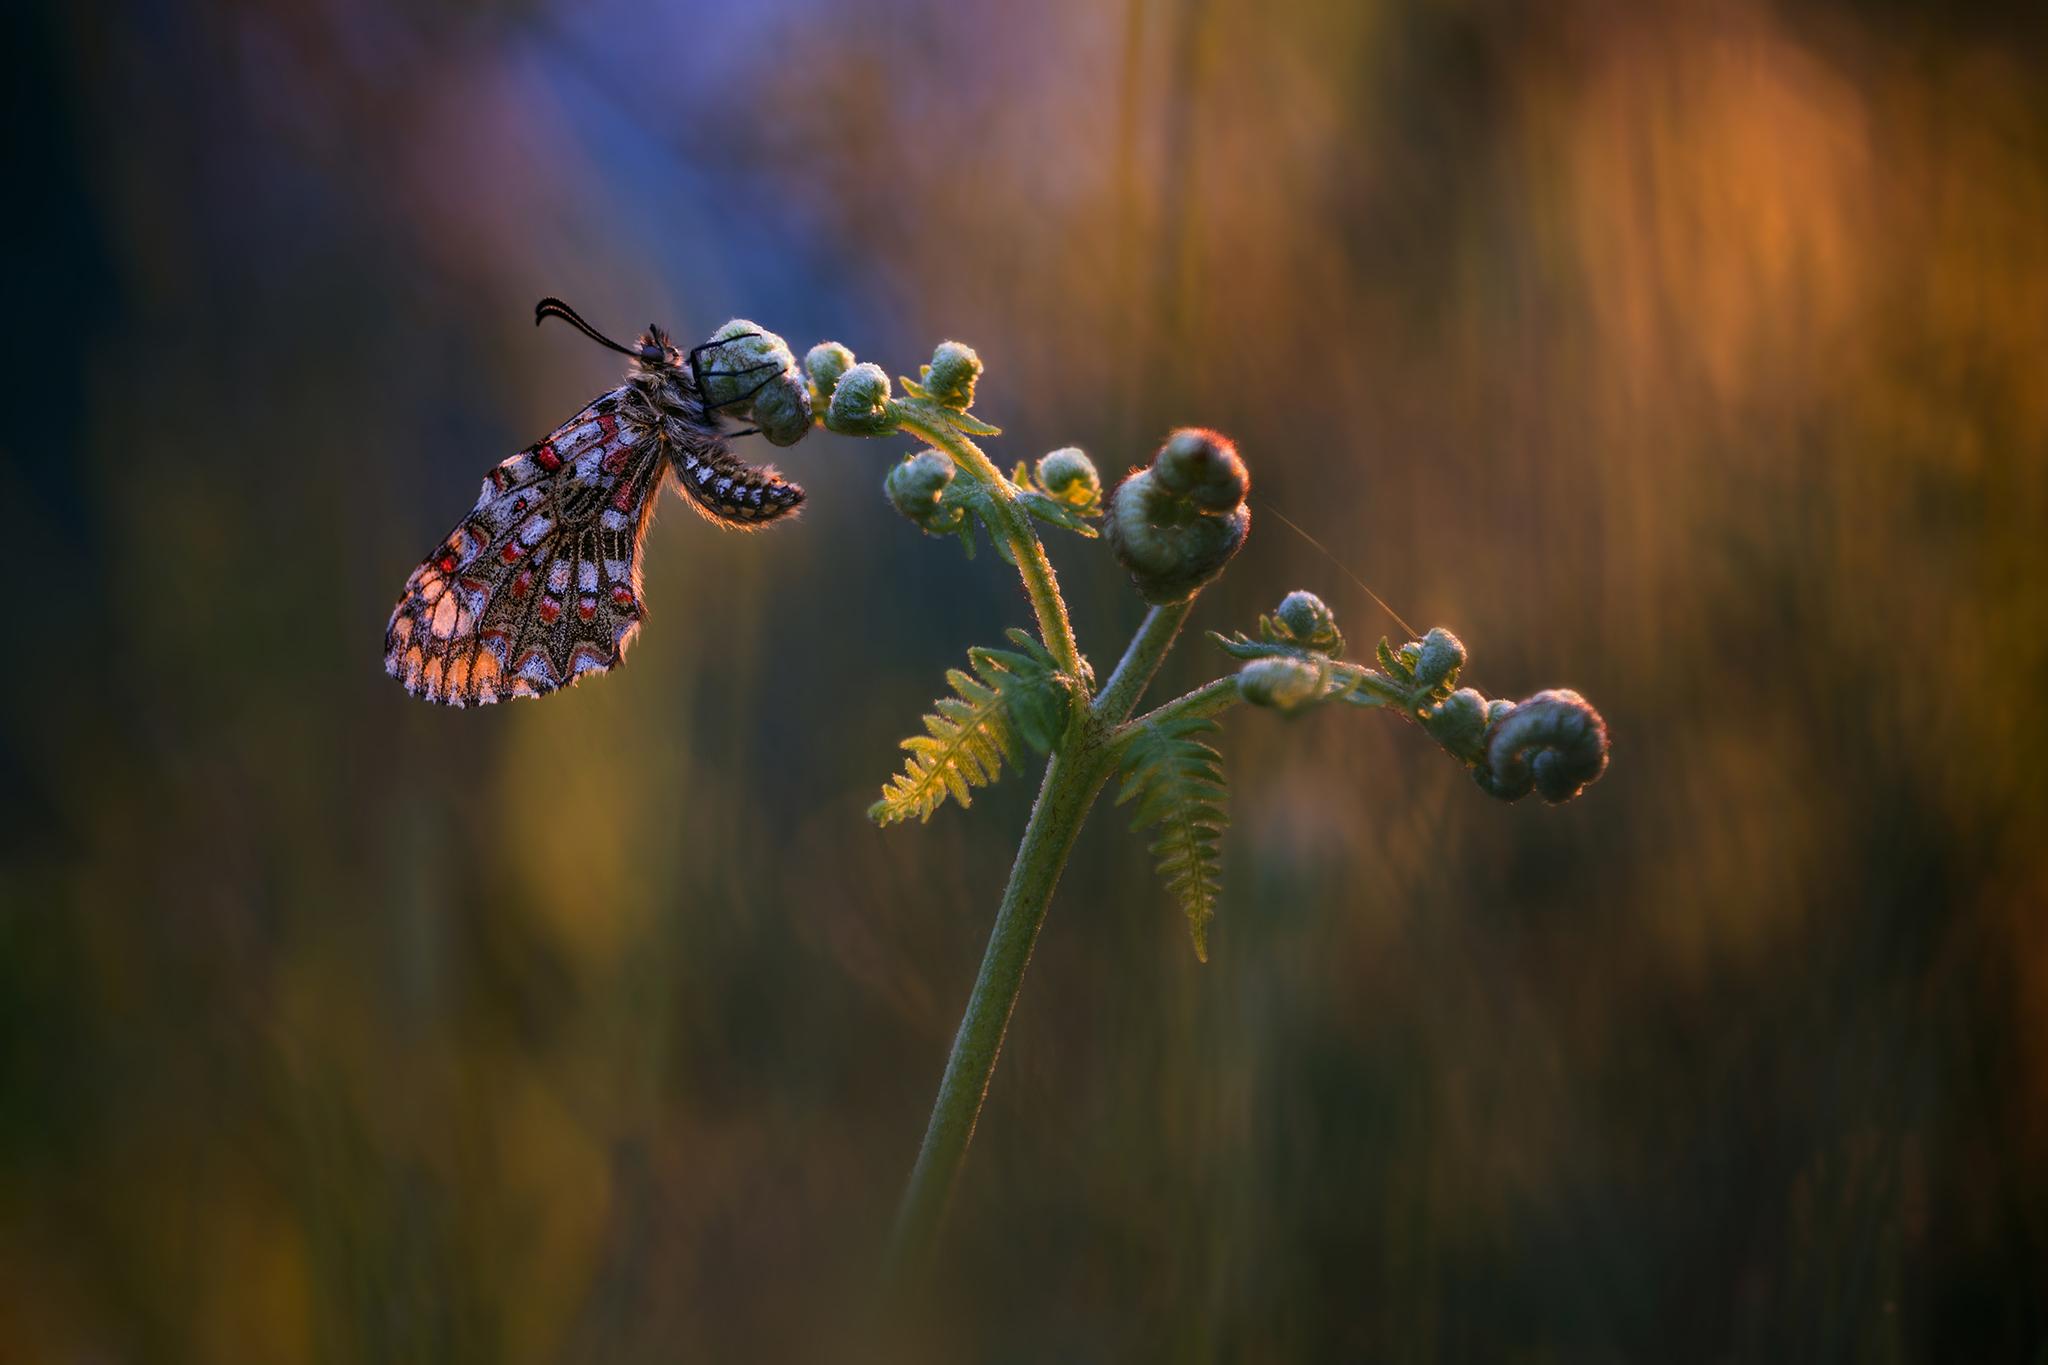 бабочка папоротник  № 3138399 без смс